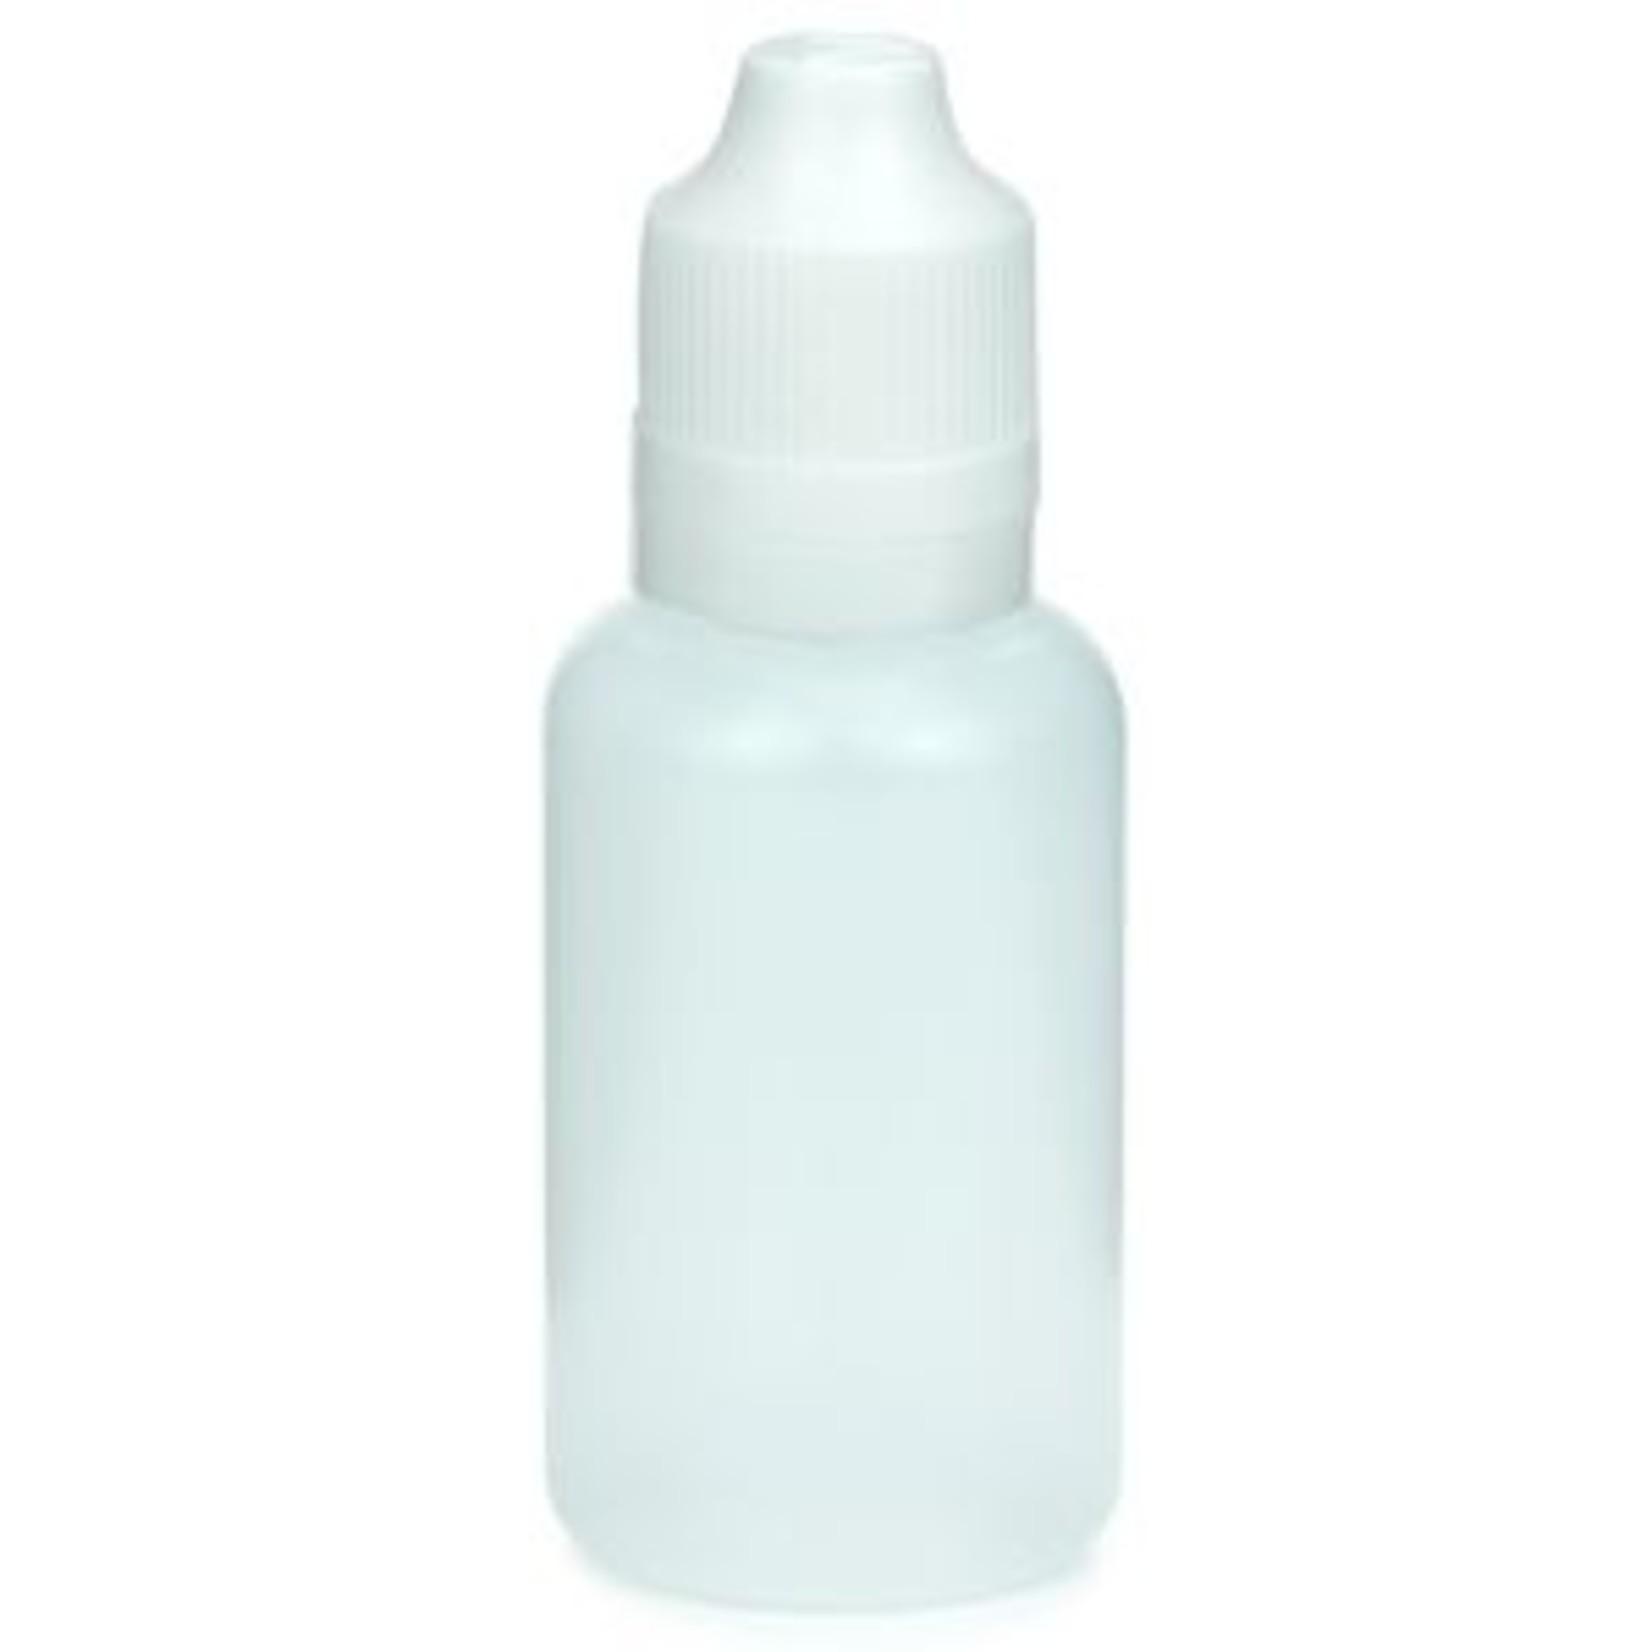 E-Liquid Flasche 30ml